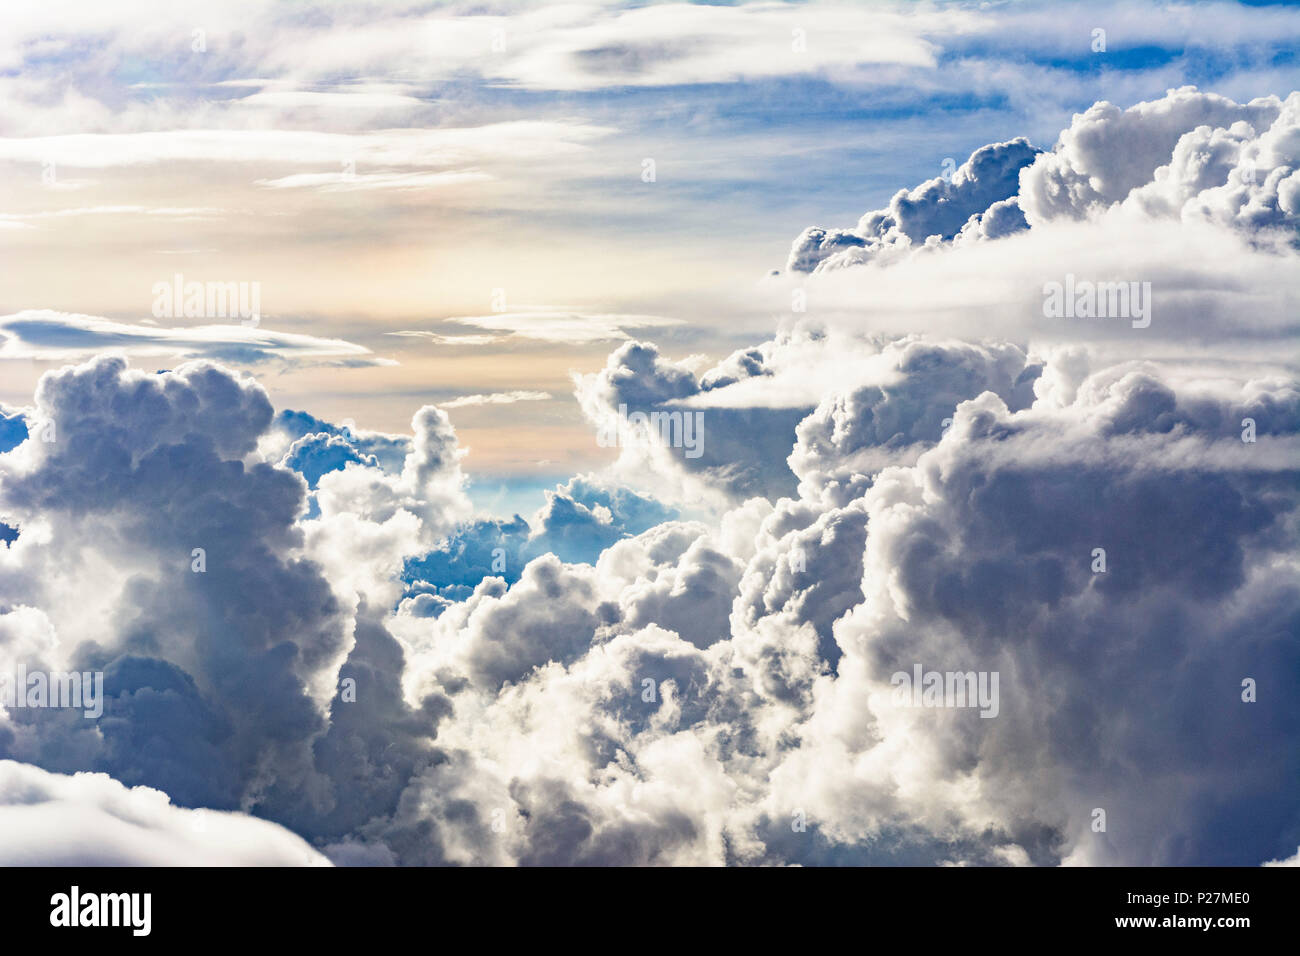 tropical clouds, cumulonimbus cloud, from aircraft, - Stock Image